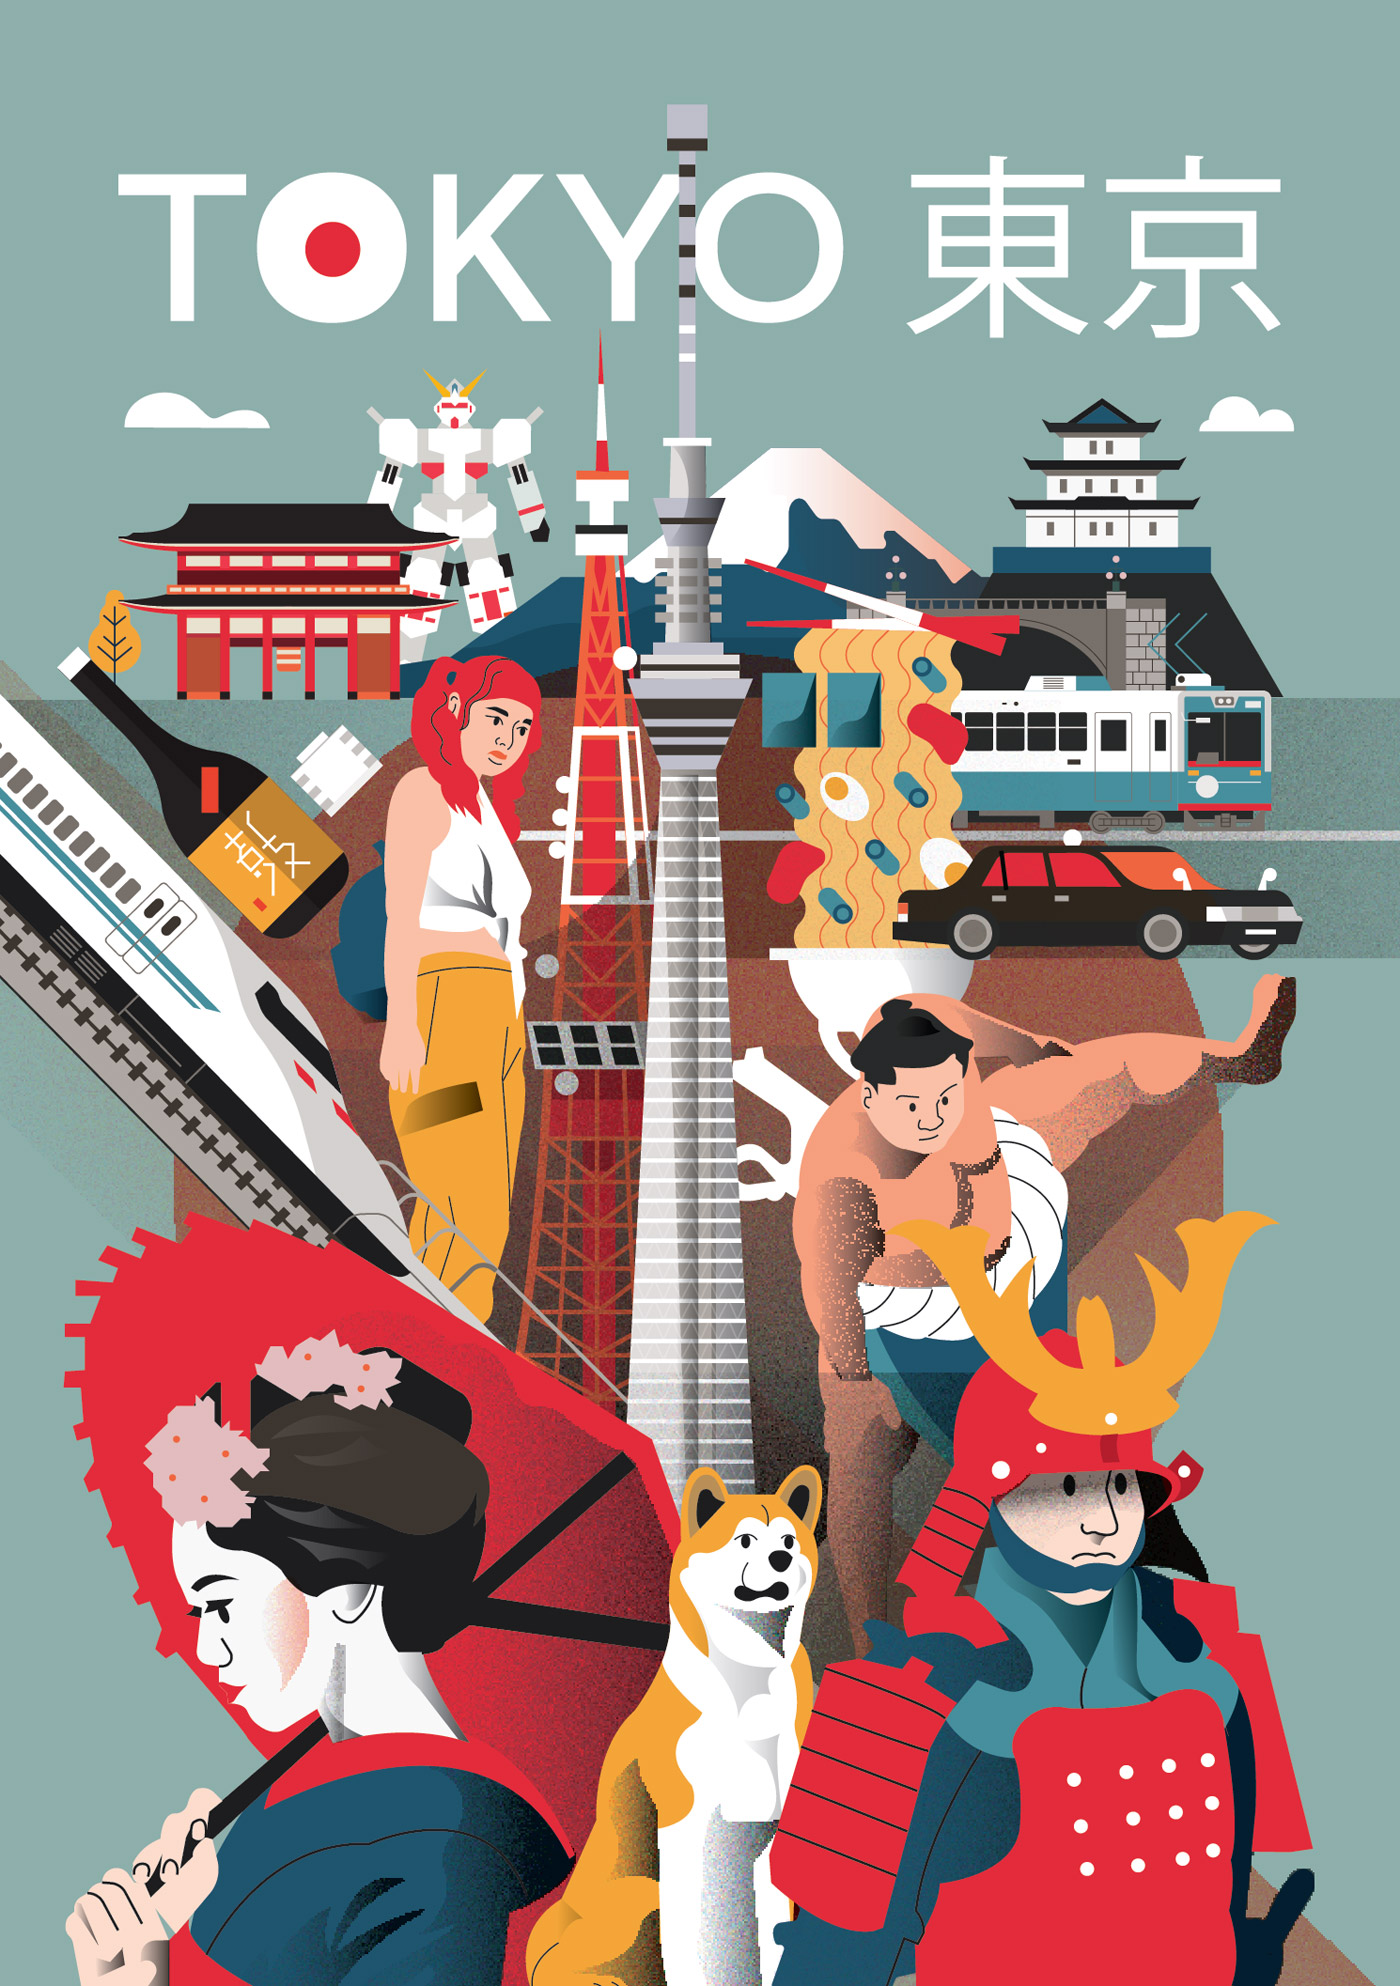 Tokyo city poster by Arunas Kacinskas